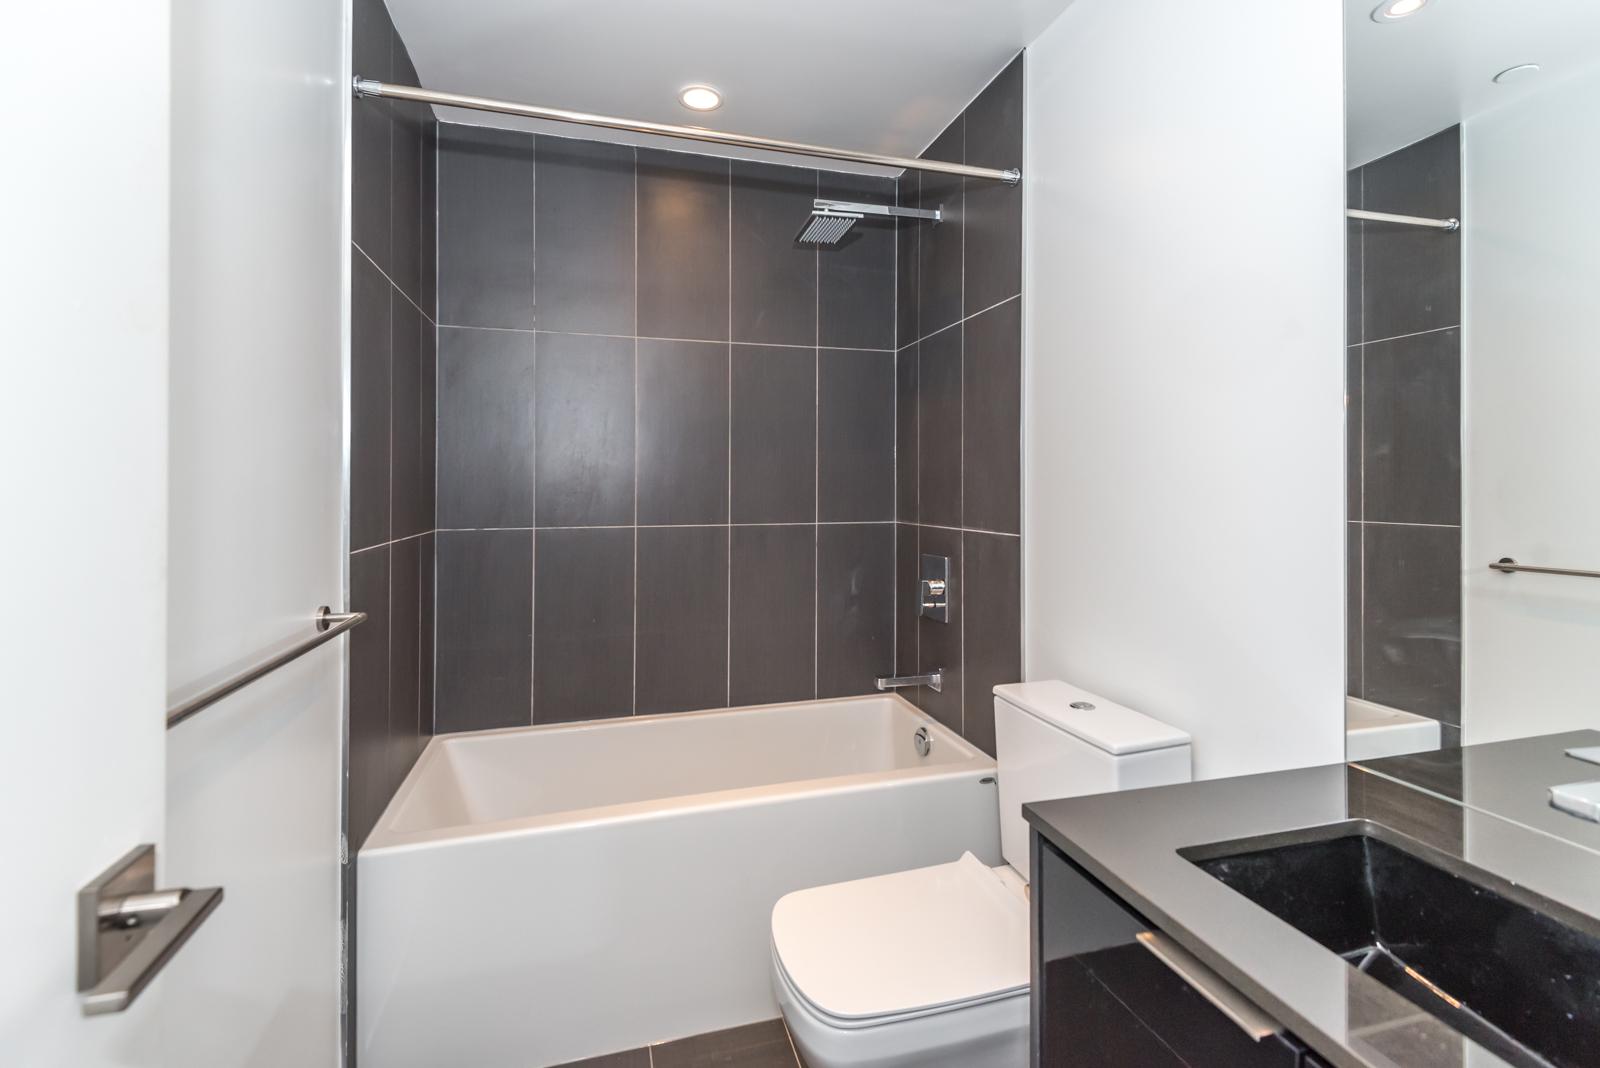 Photo of 70 Temperance Street's bathroom